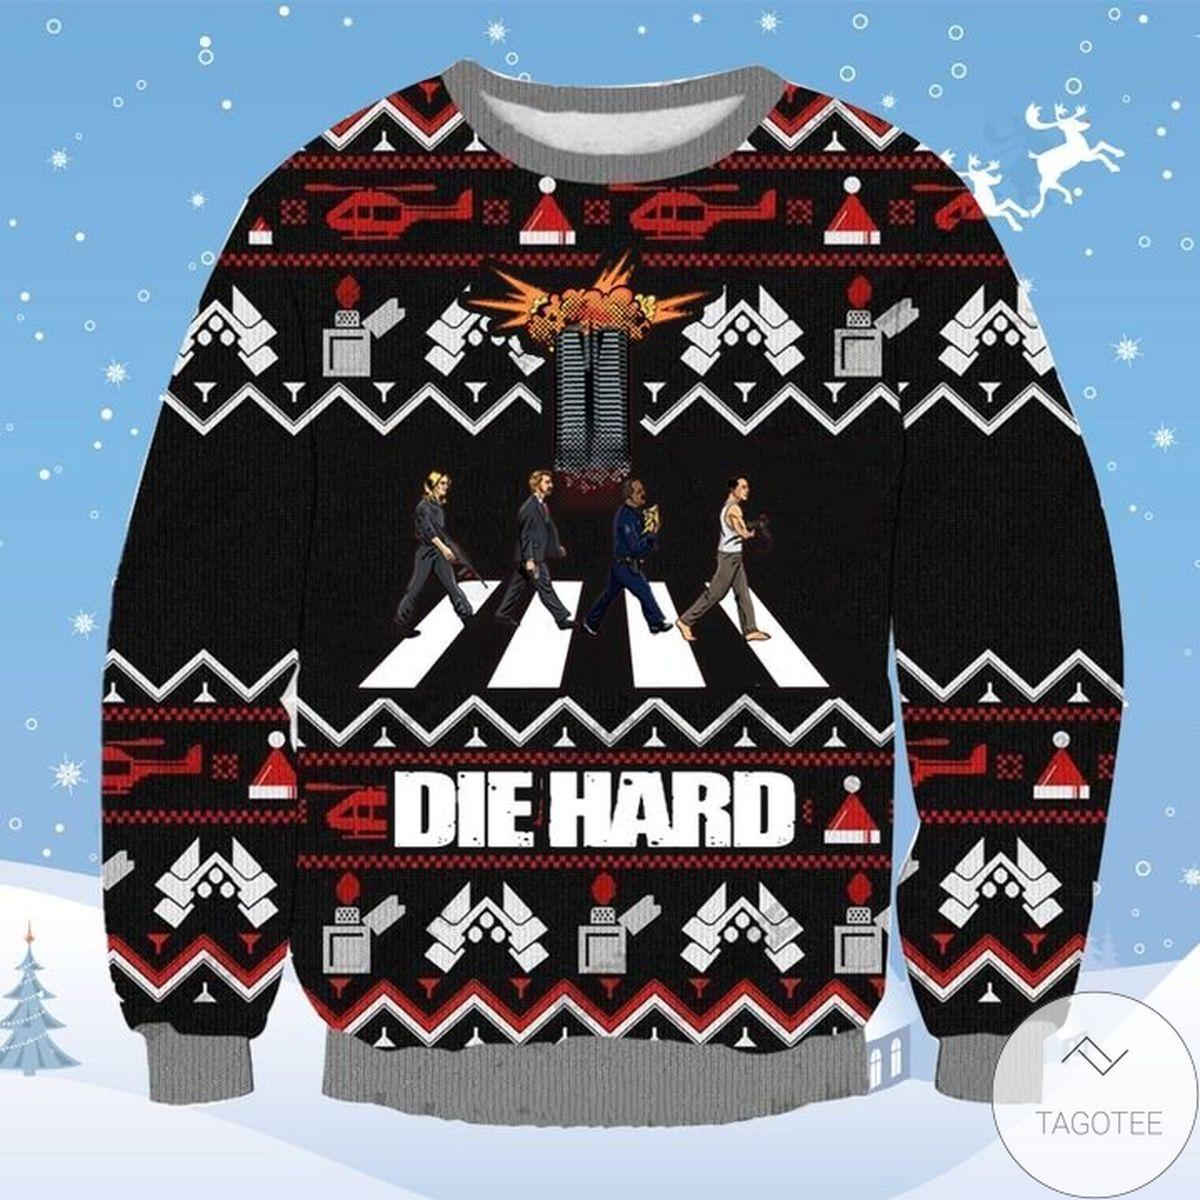 Print On Demand Die Hard Ugly Christmas Sweater